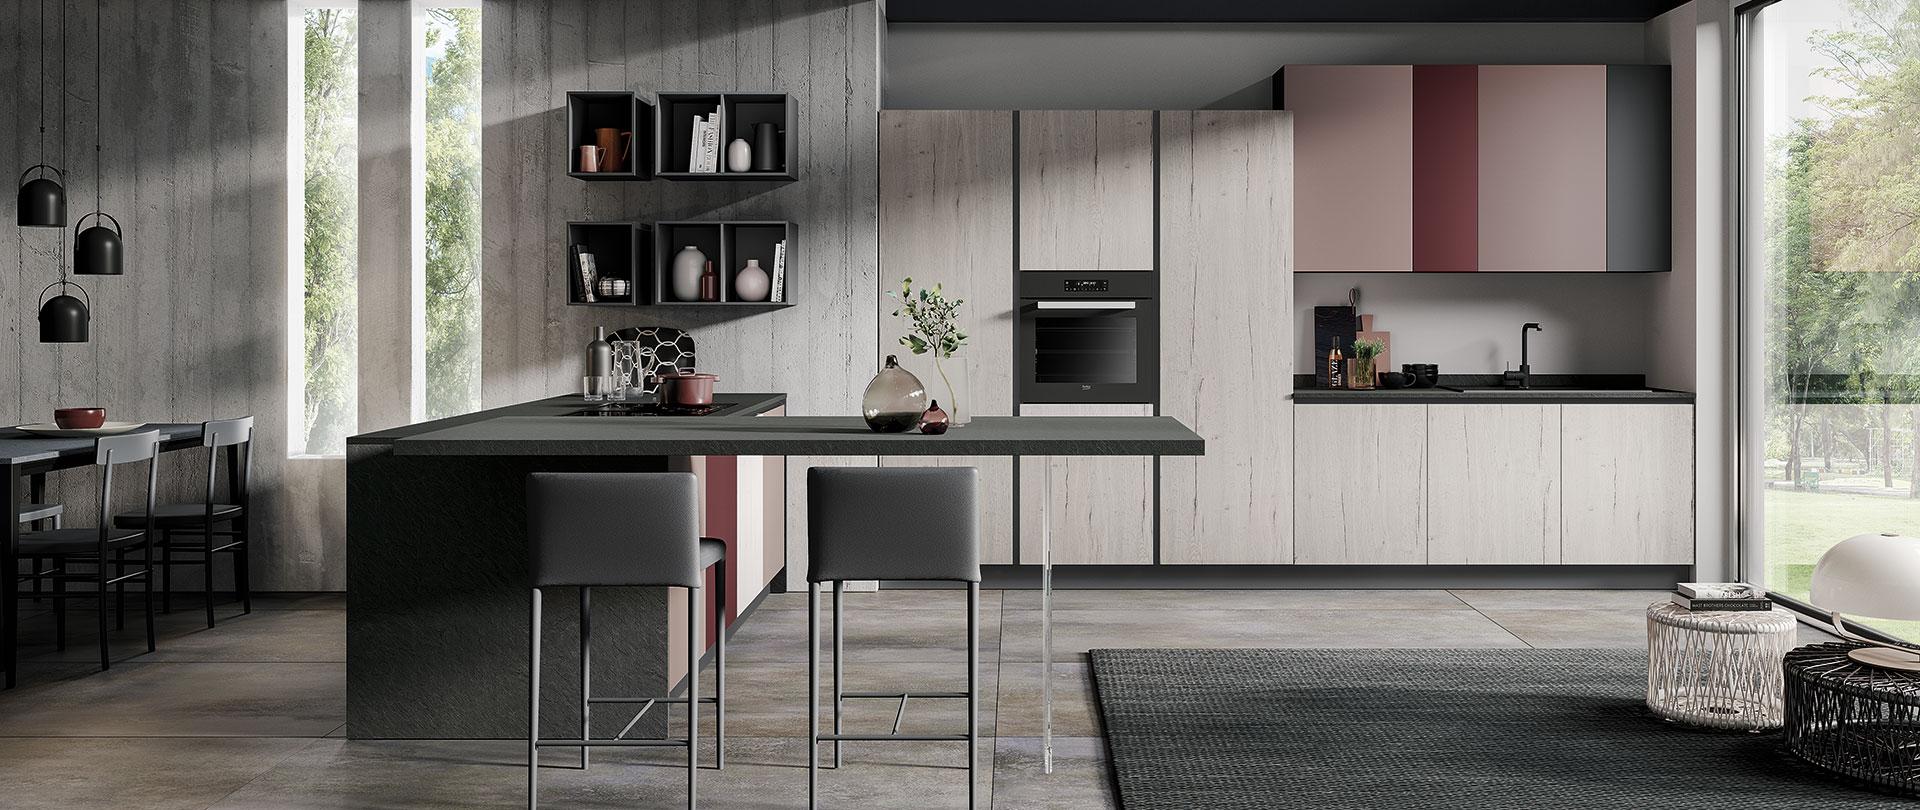 Cucina ergonomica Hilary rovere bianco rosa antico bordeaux grafite